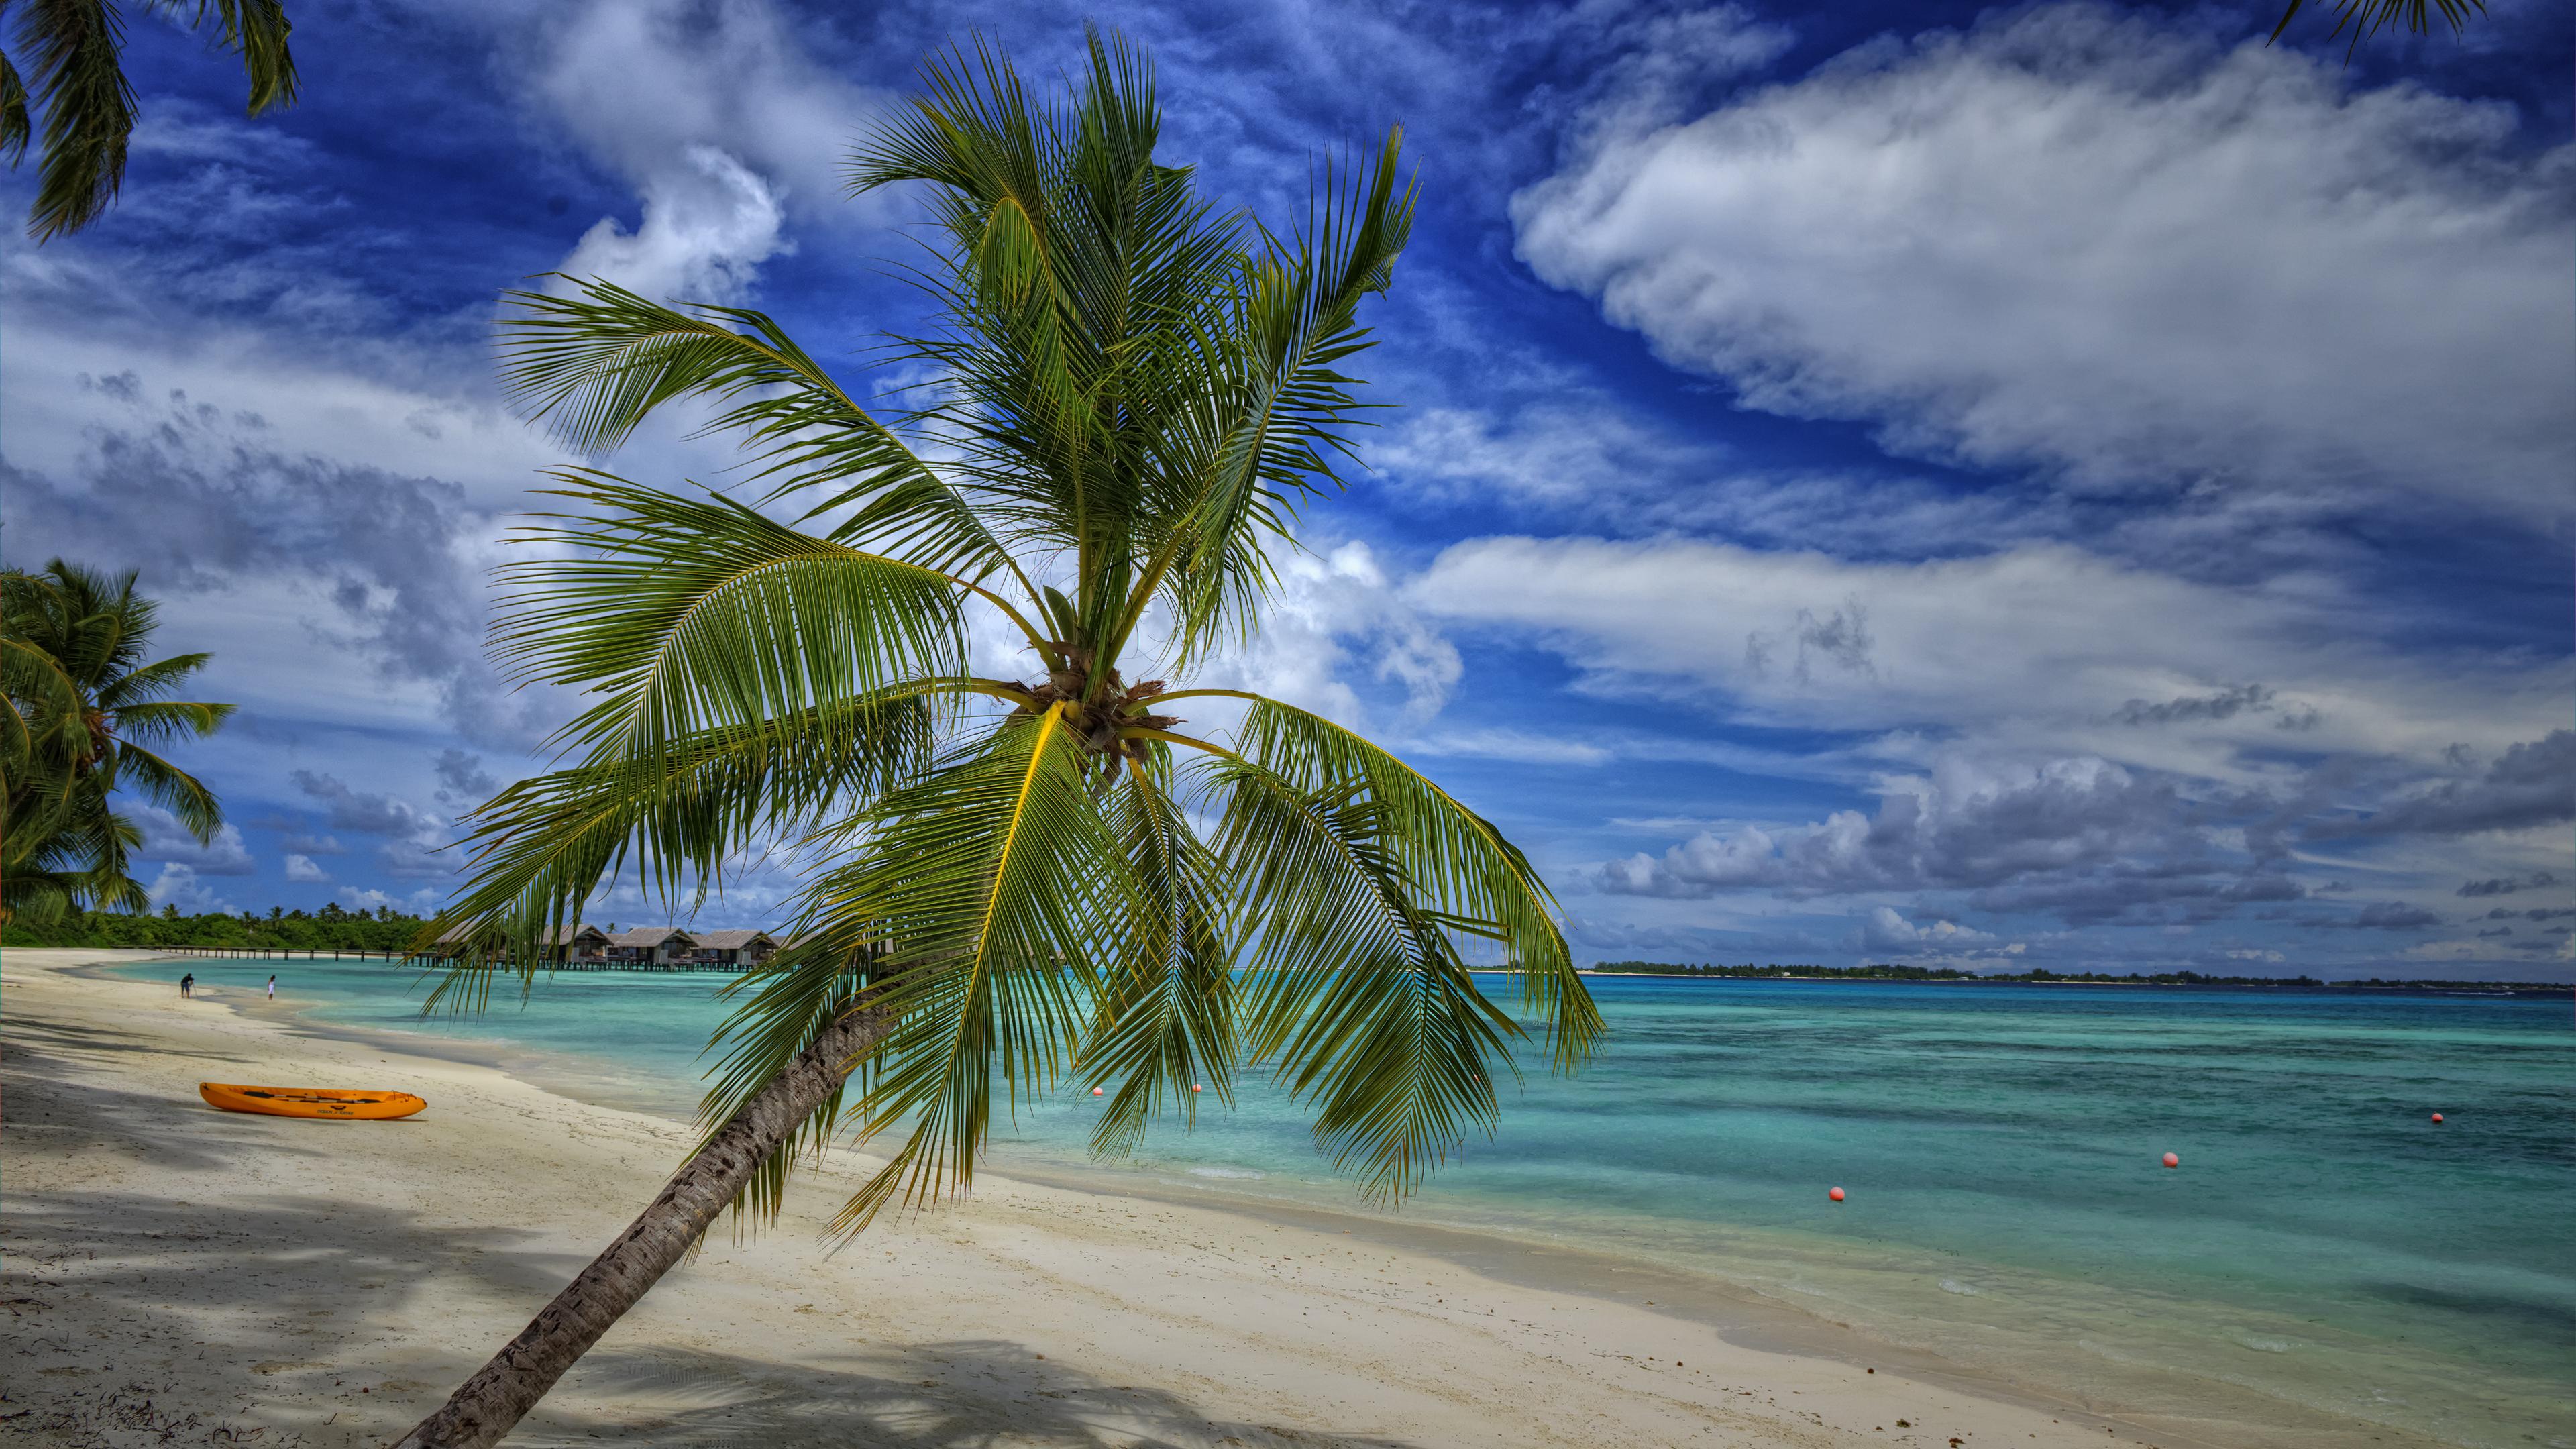 Leaning Palmtree